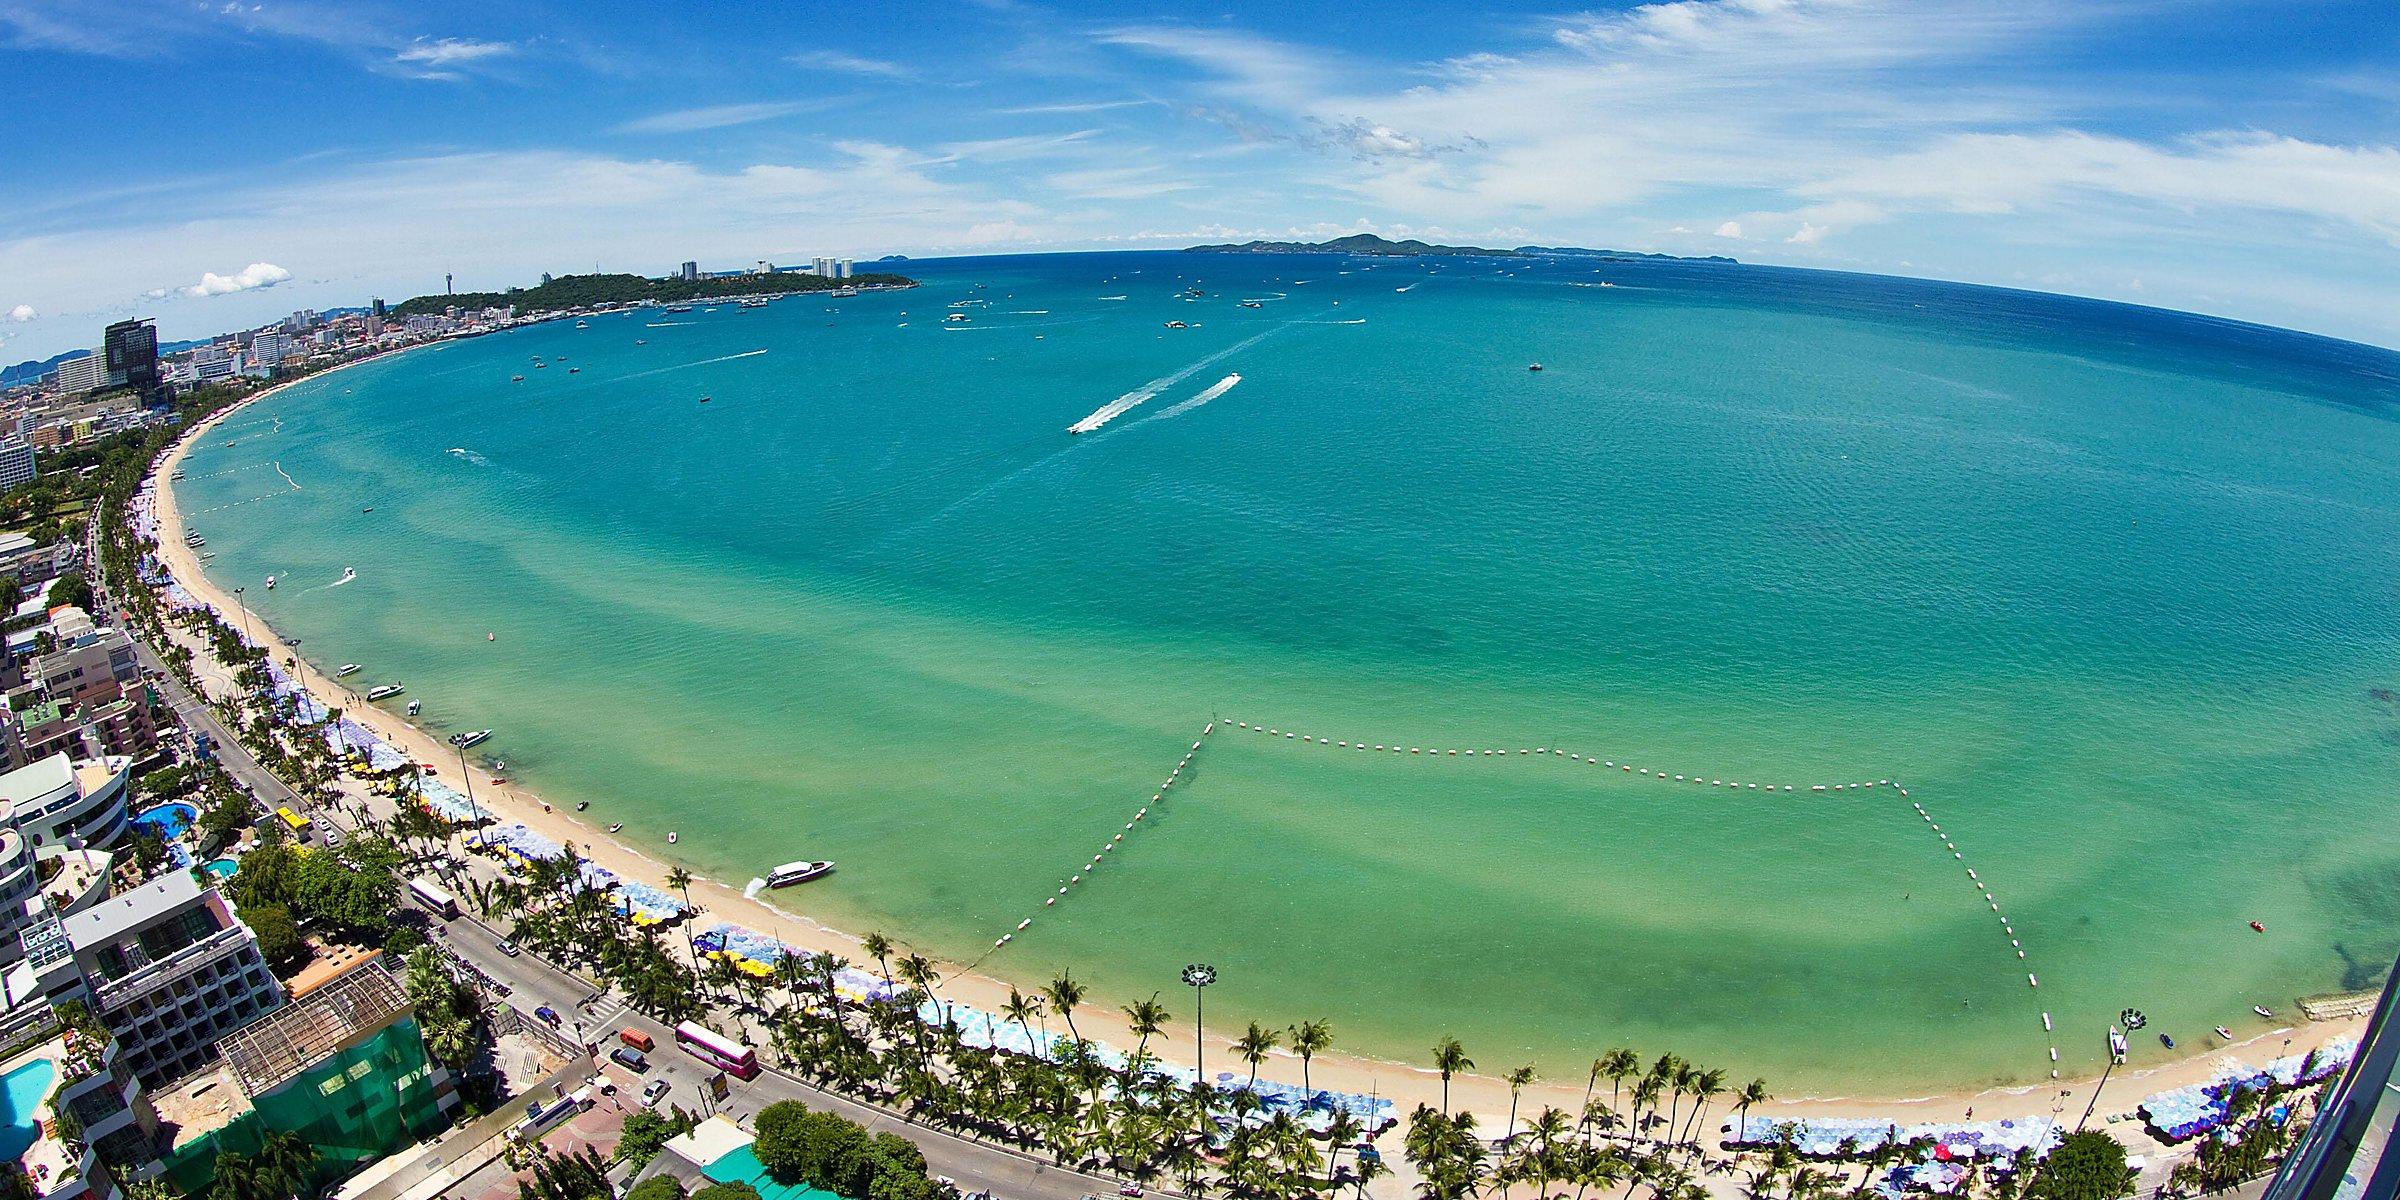 InterContinental 芭堤雅洲际度假酒店- Pattaya